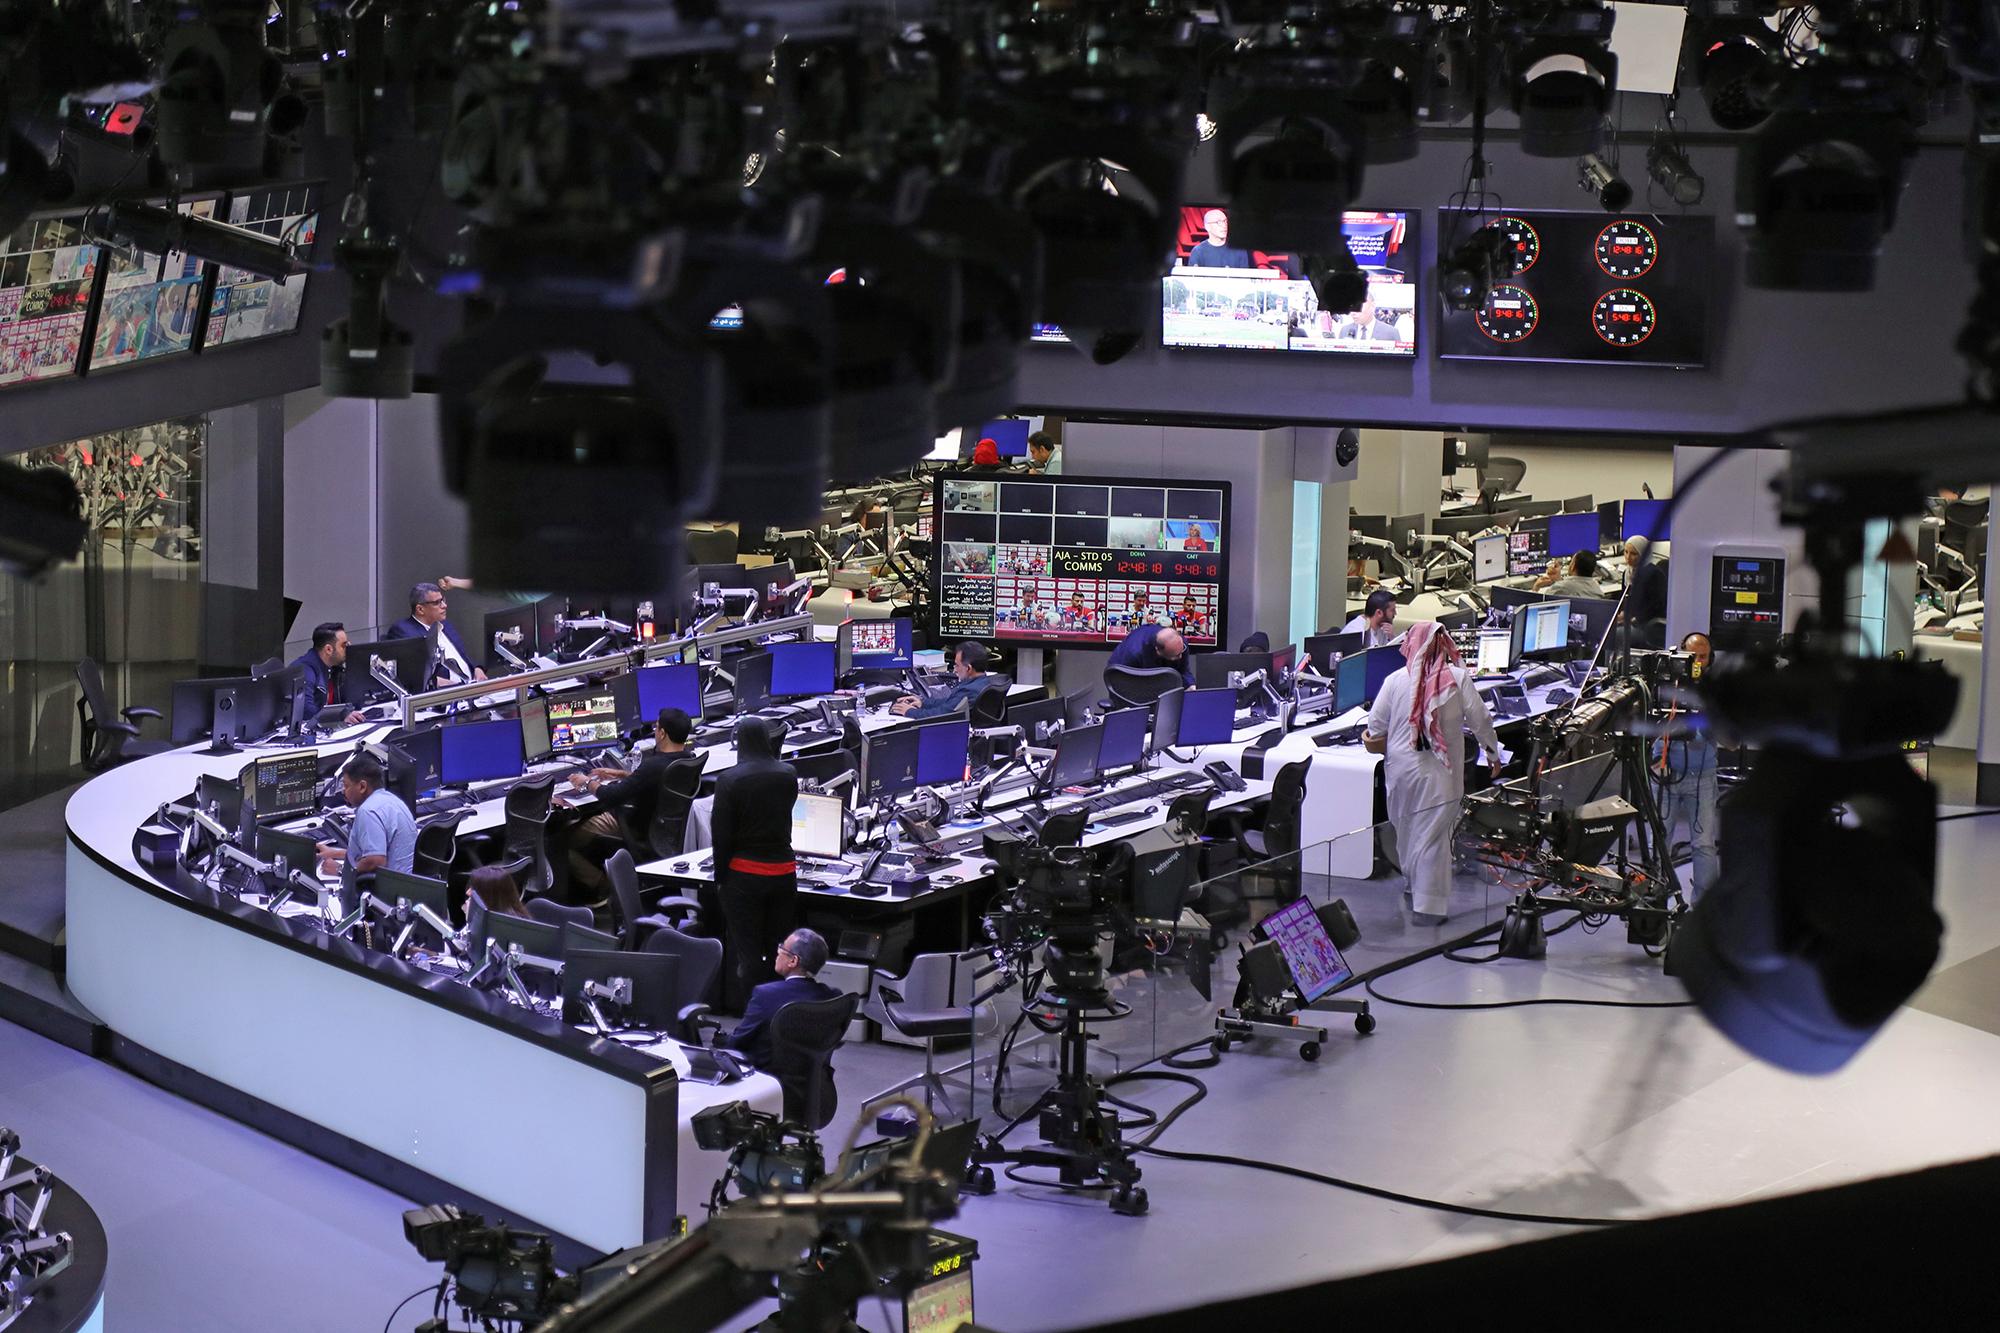 doj-orders-al-jazeera-platform-to-register-as-foreign-agent Photo